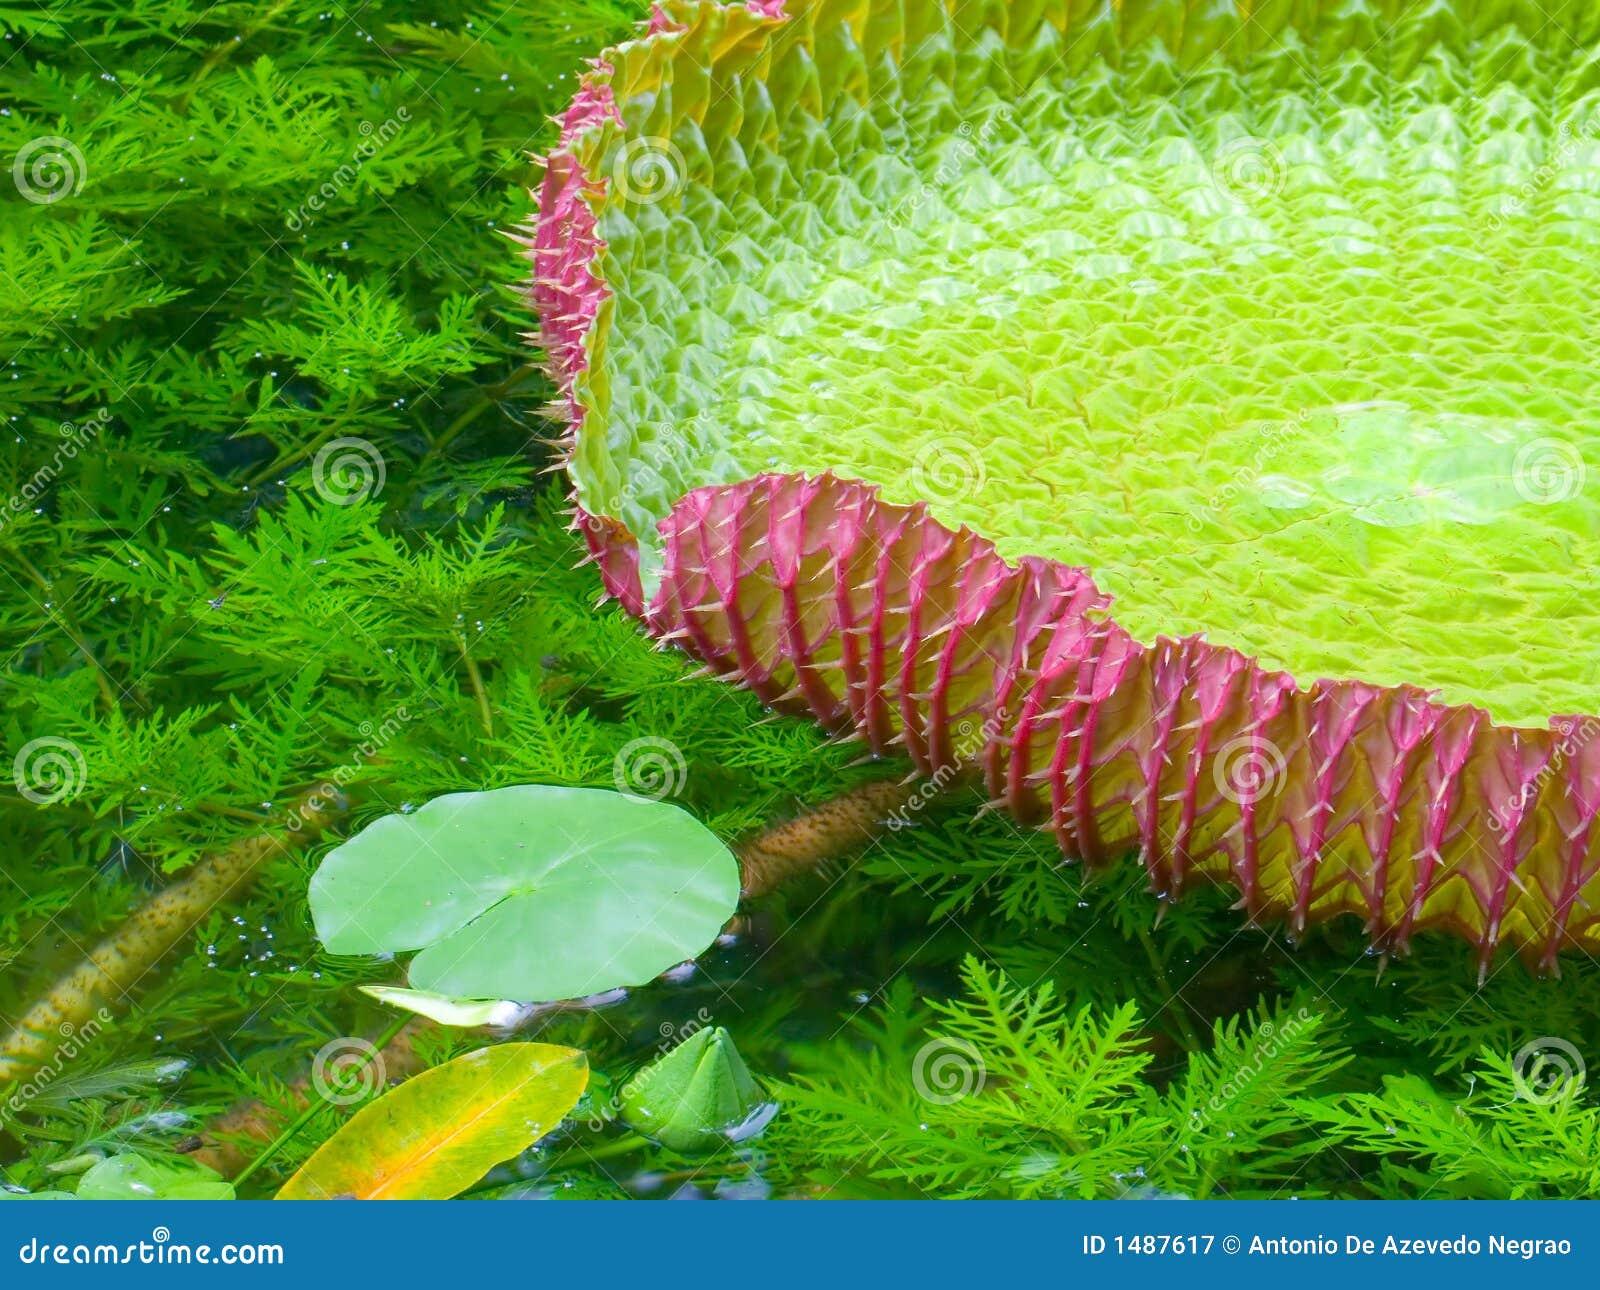 Plante aquatique photographie stock libre de droits image 1487617 - Noms de plantes aquatiques ...